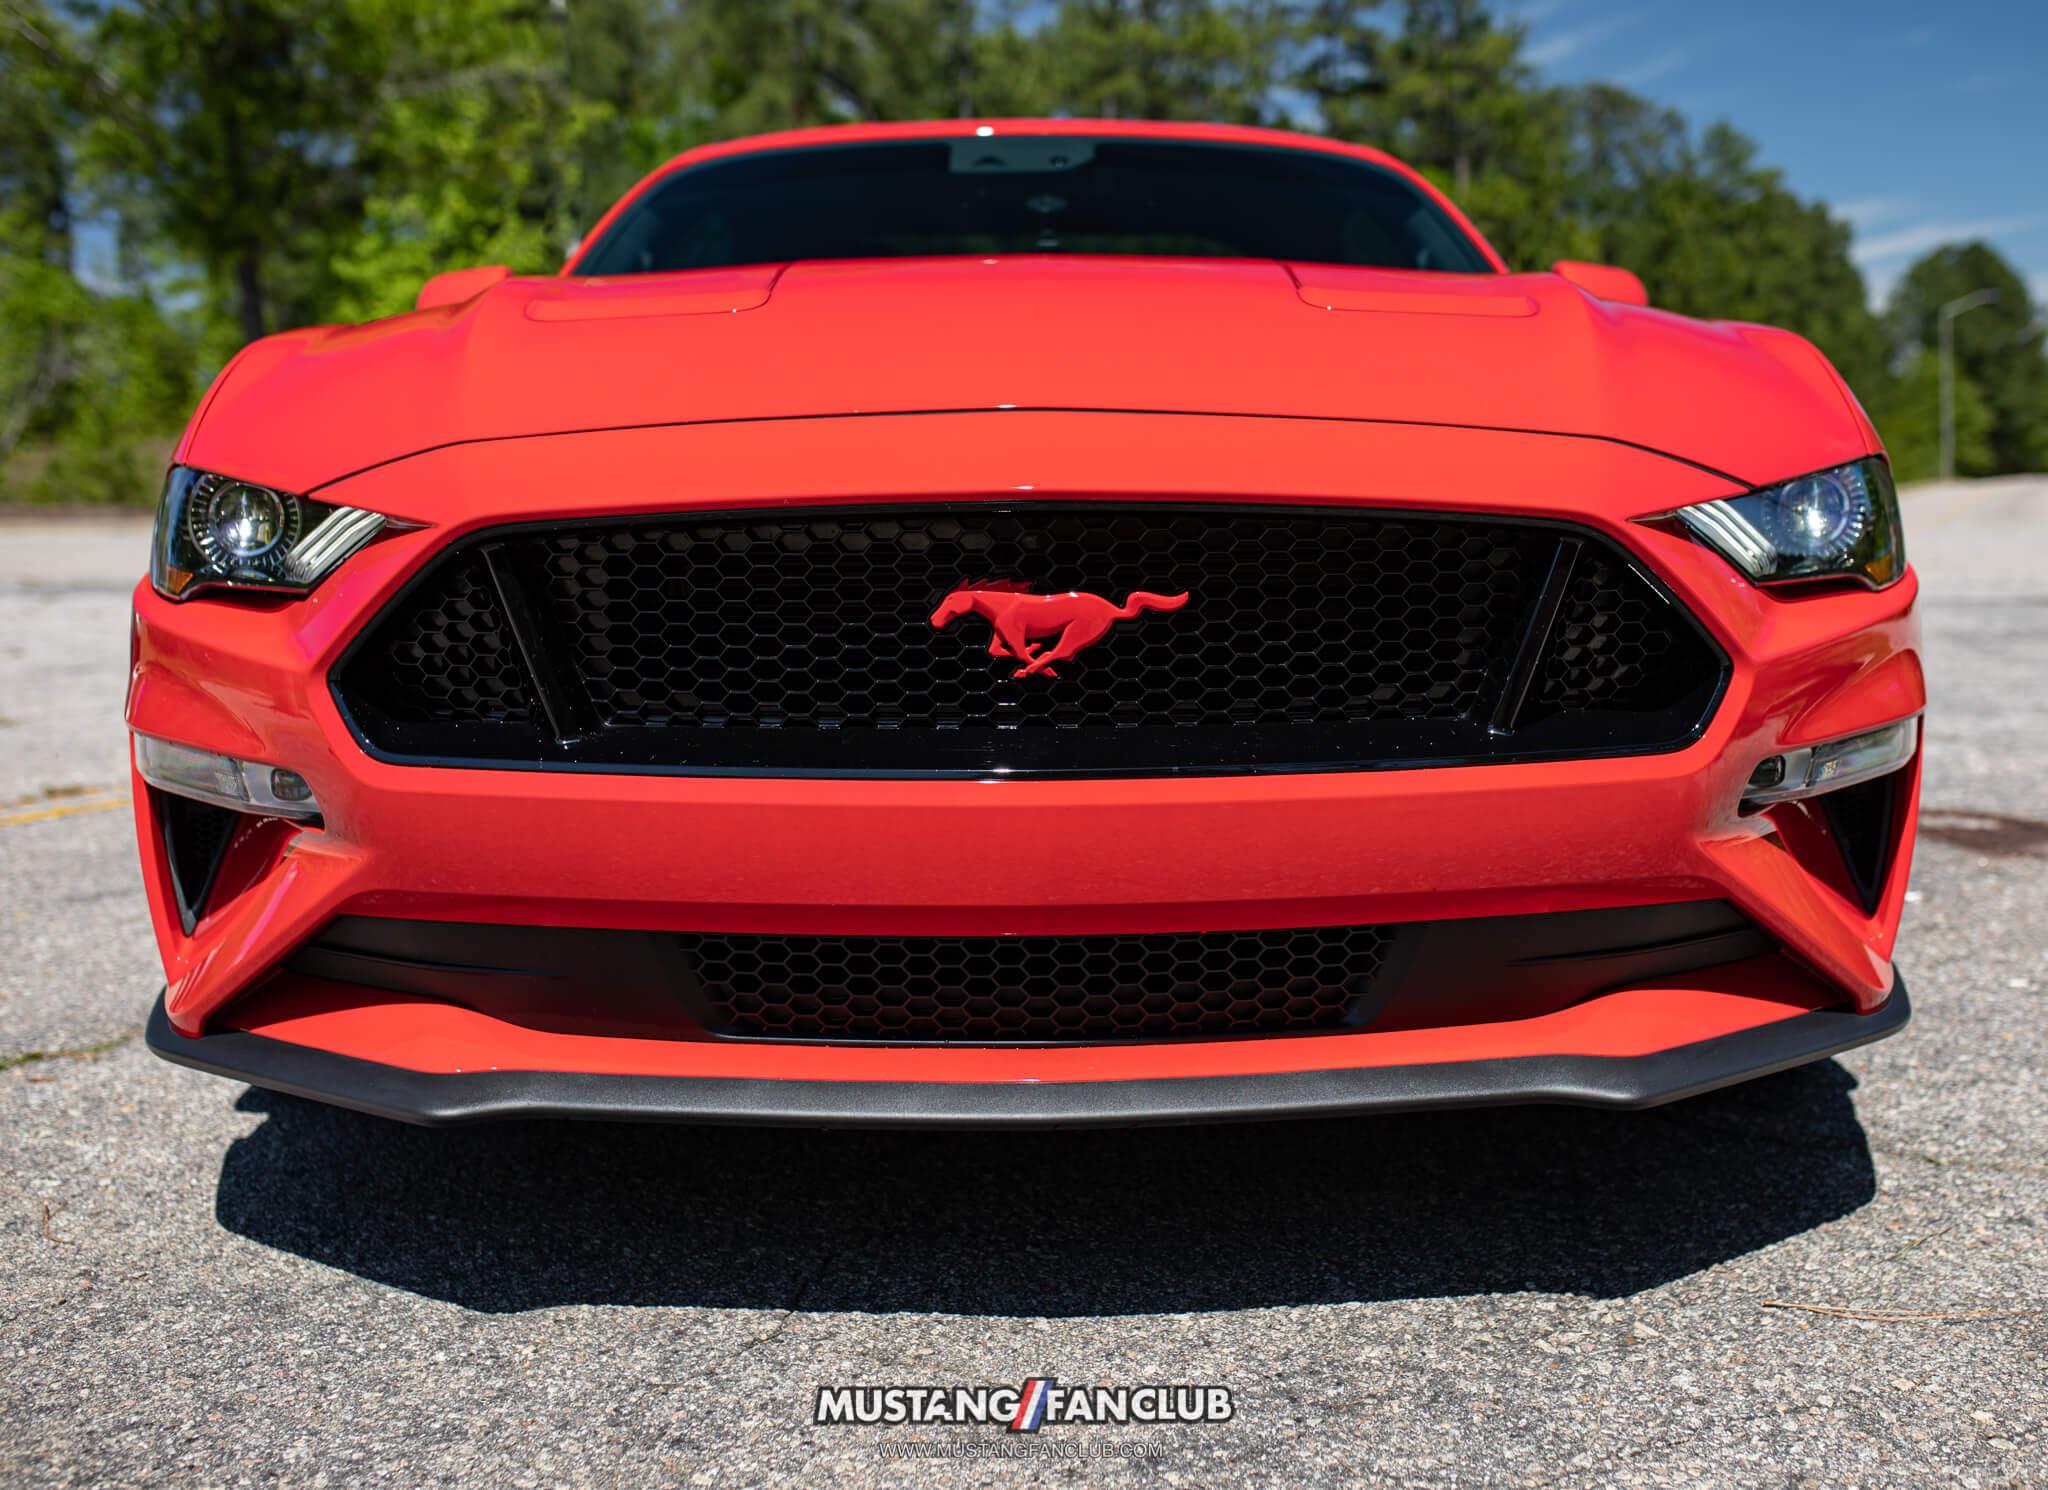 race red mustang emblem